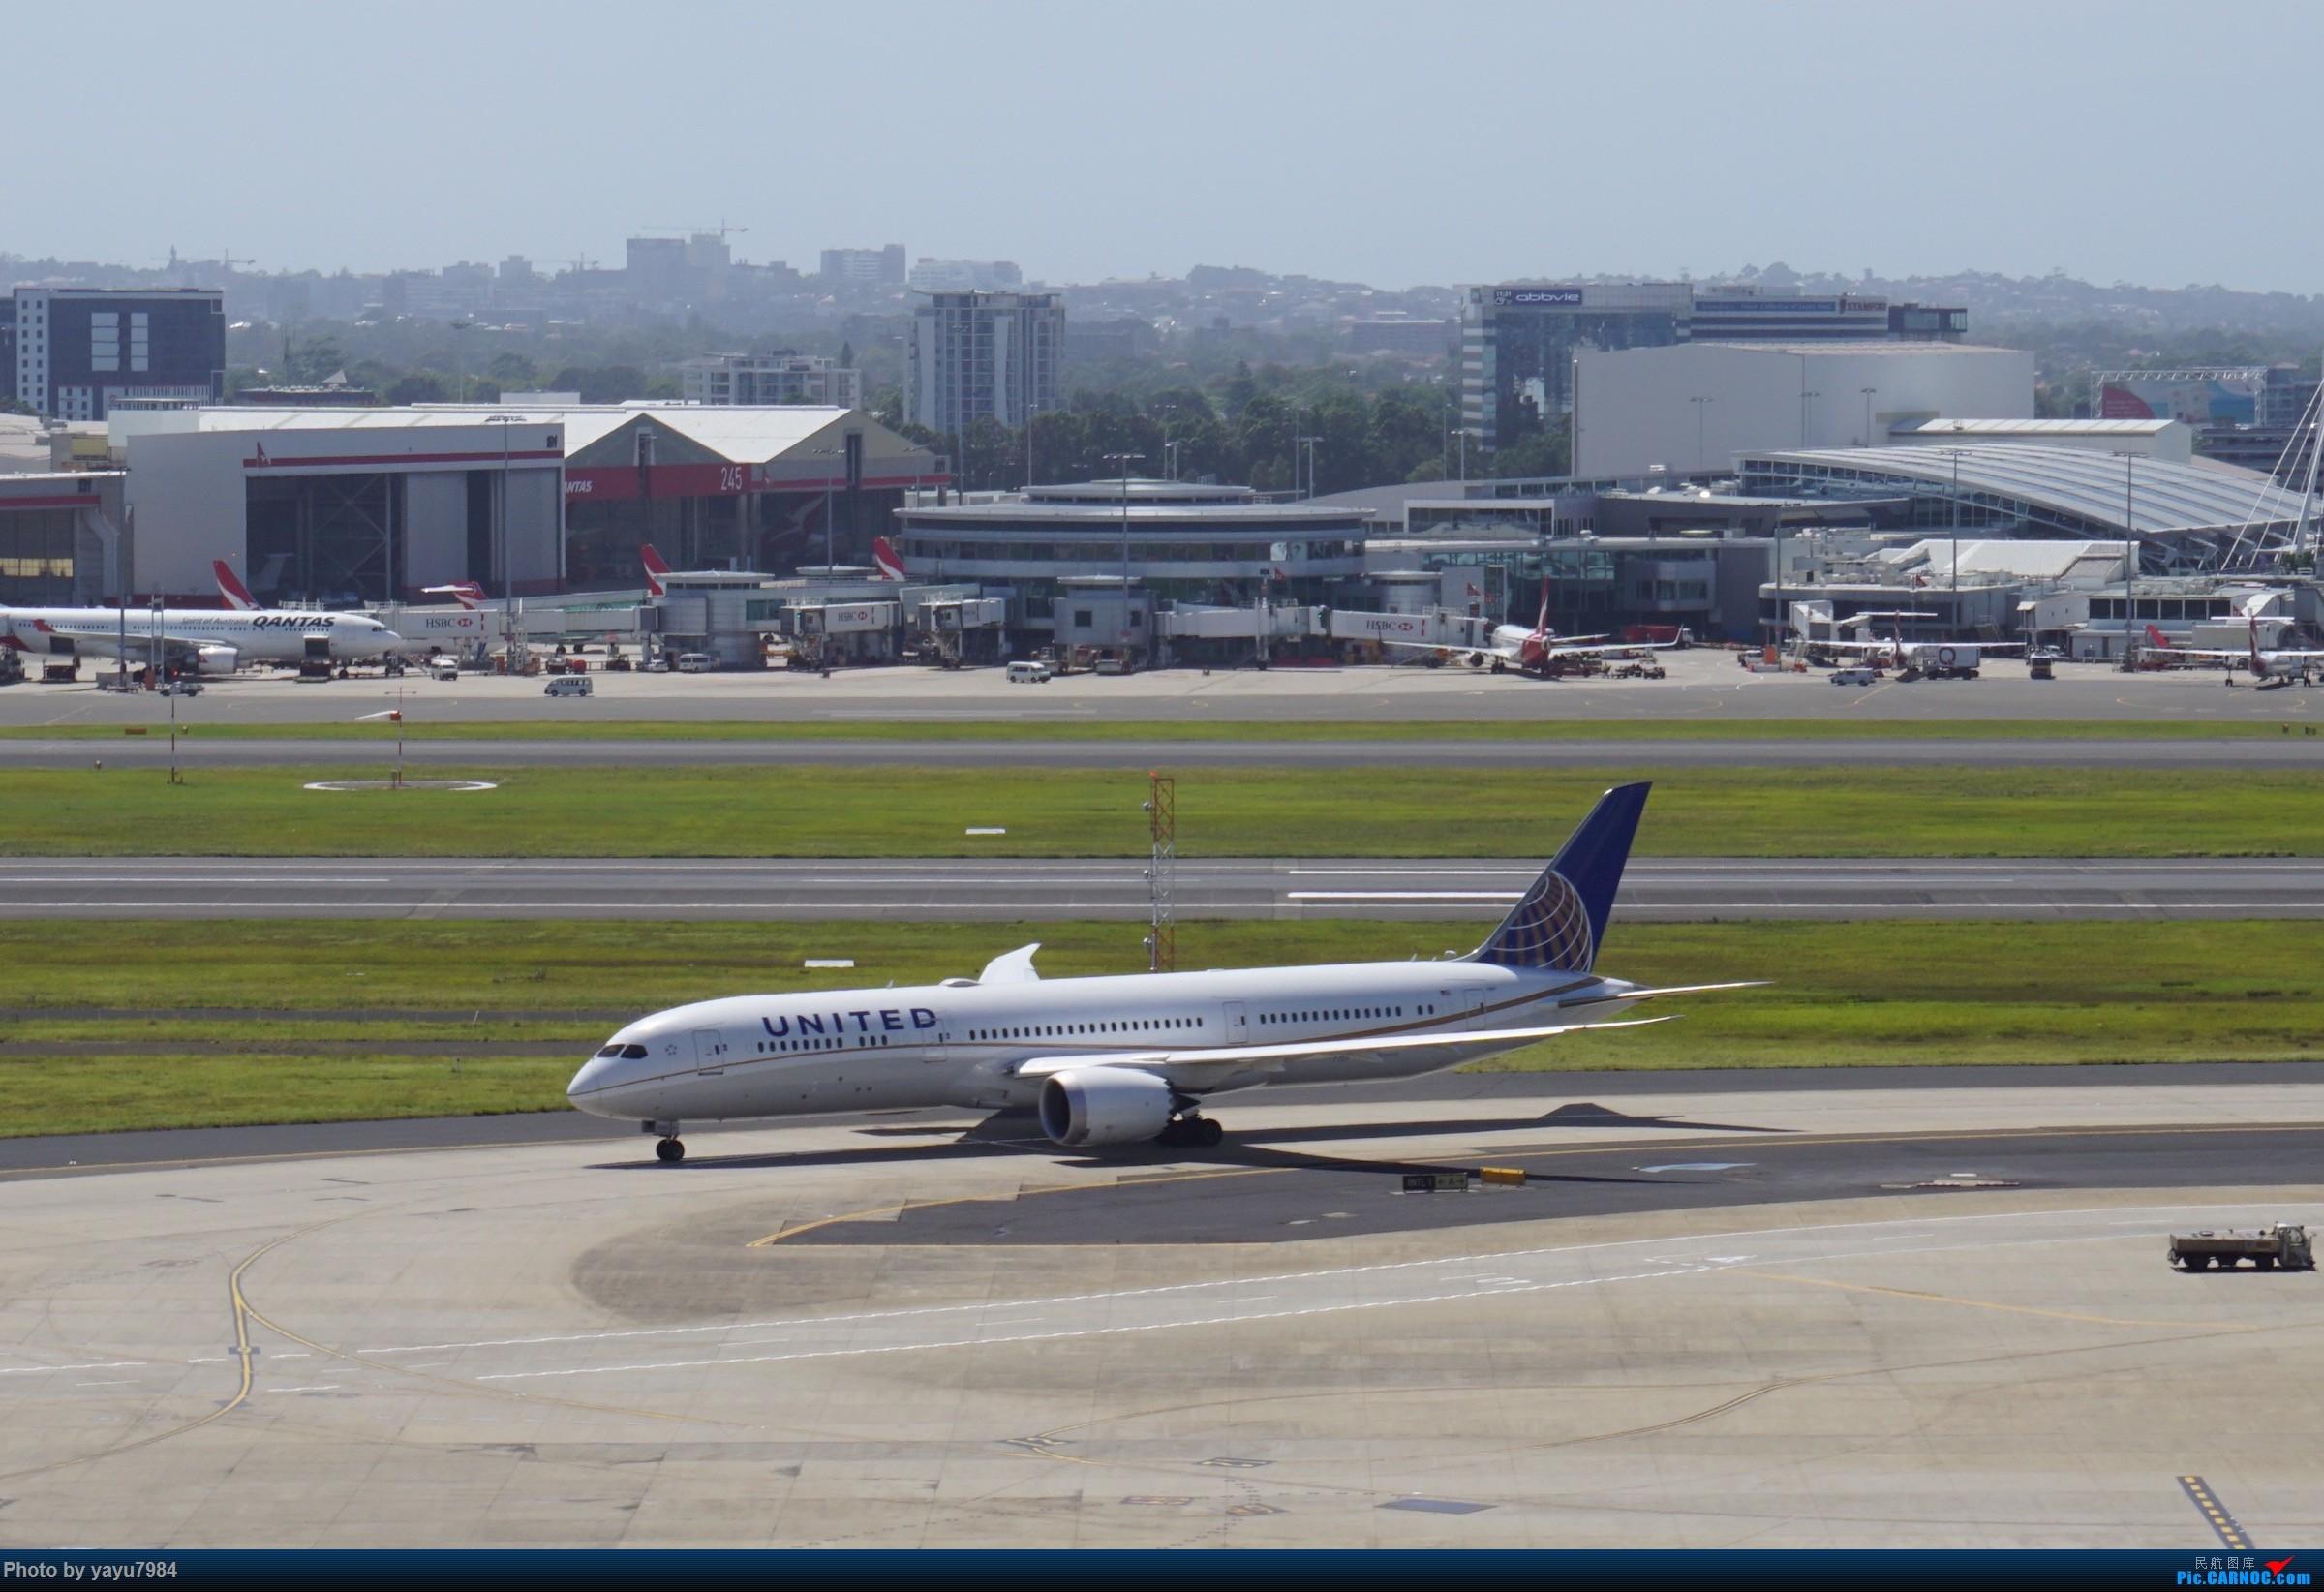 Re:[原创][SYD] 停车楼顶看宽体 BOEING 787-9 N29961 澳大利亚悉尼金斯福德·史密斯机场